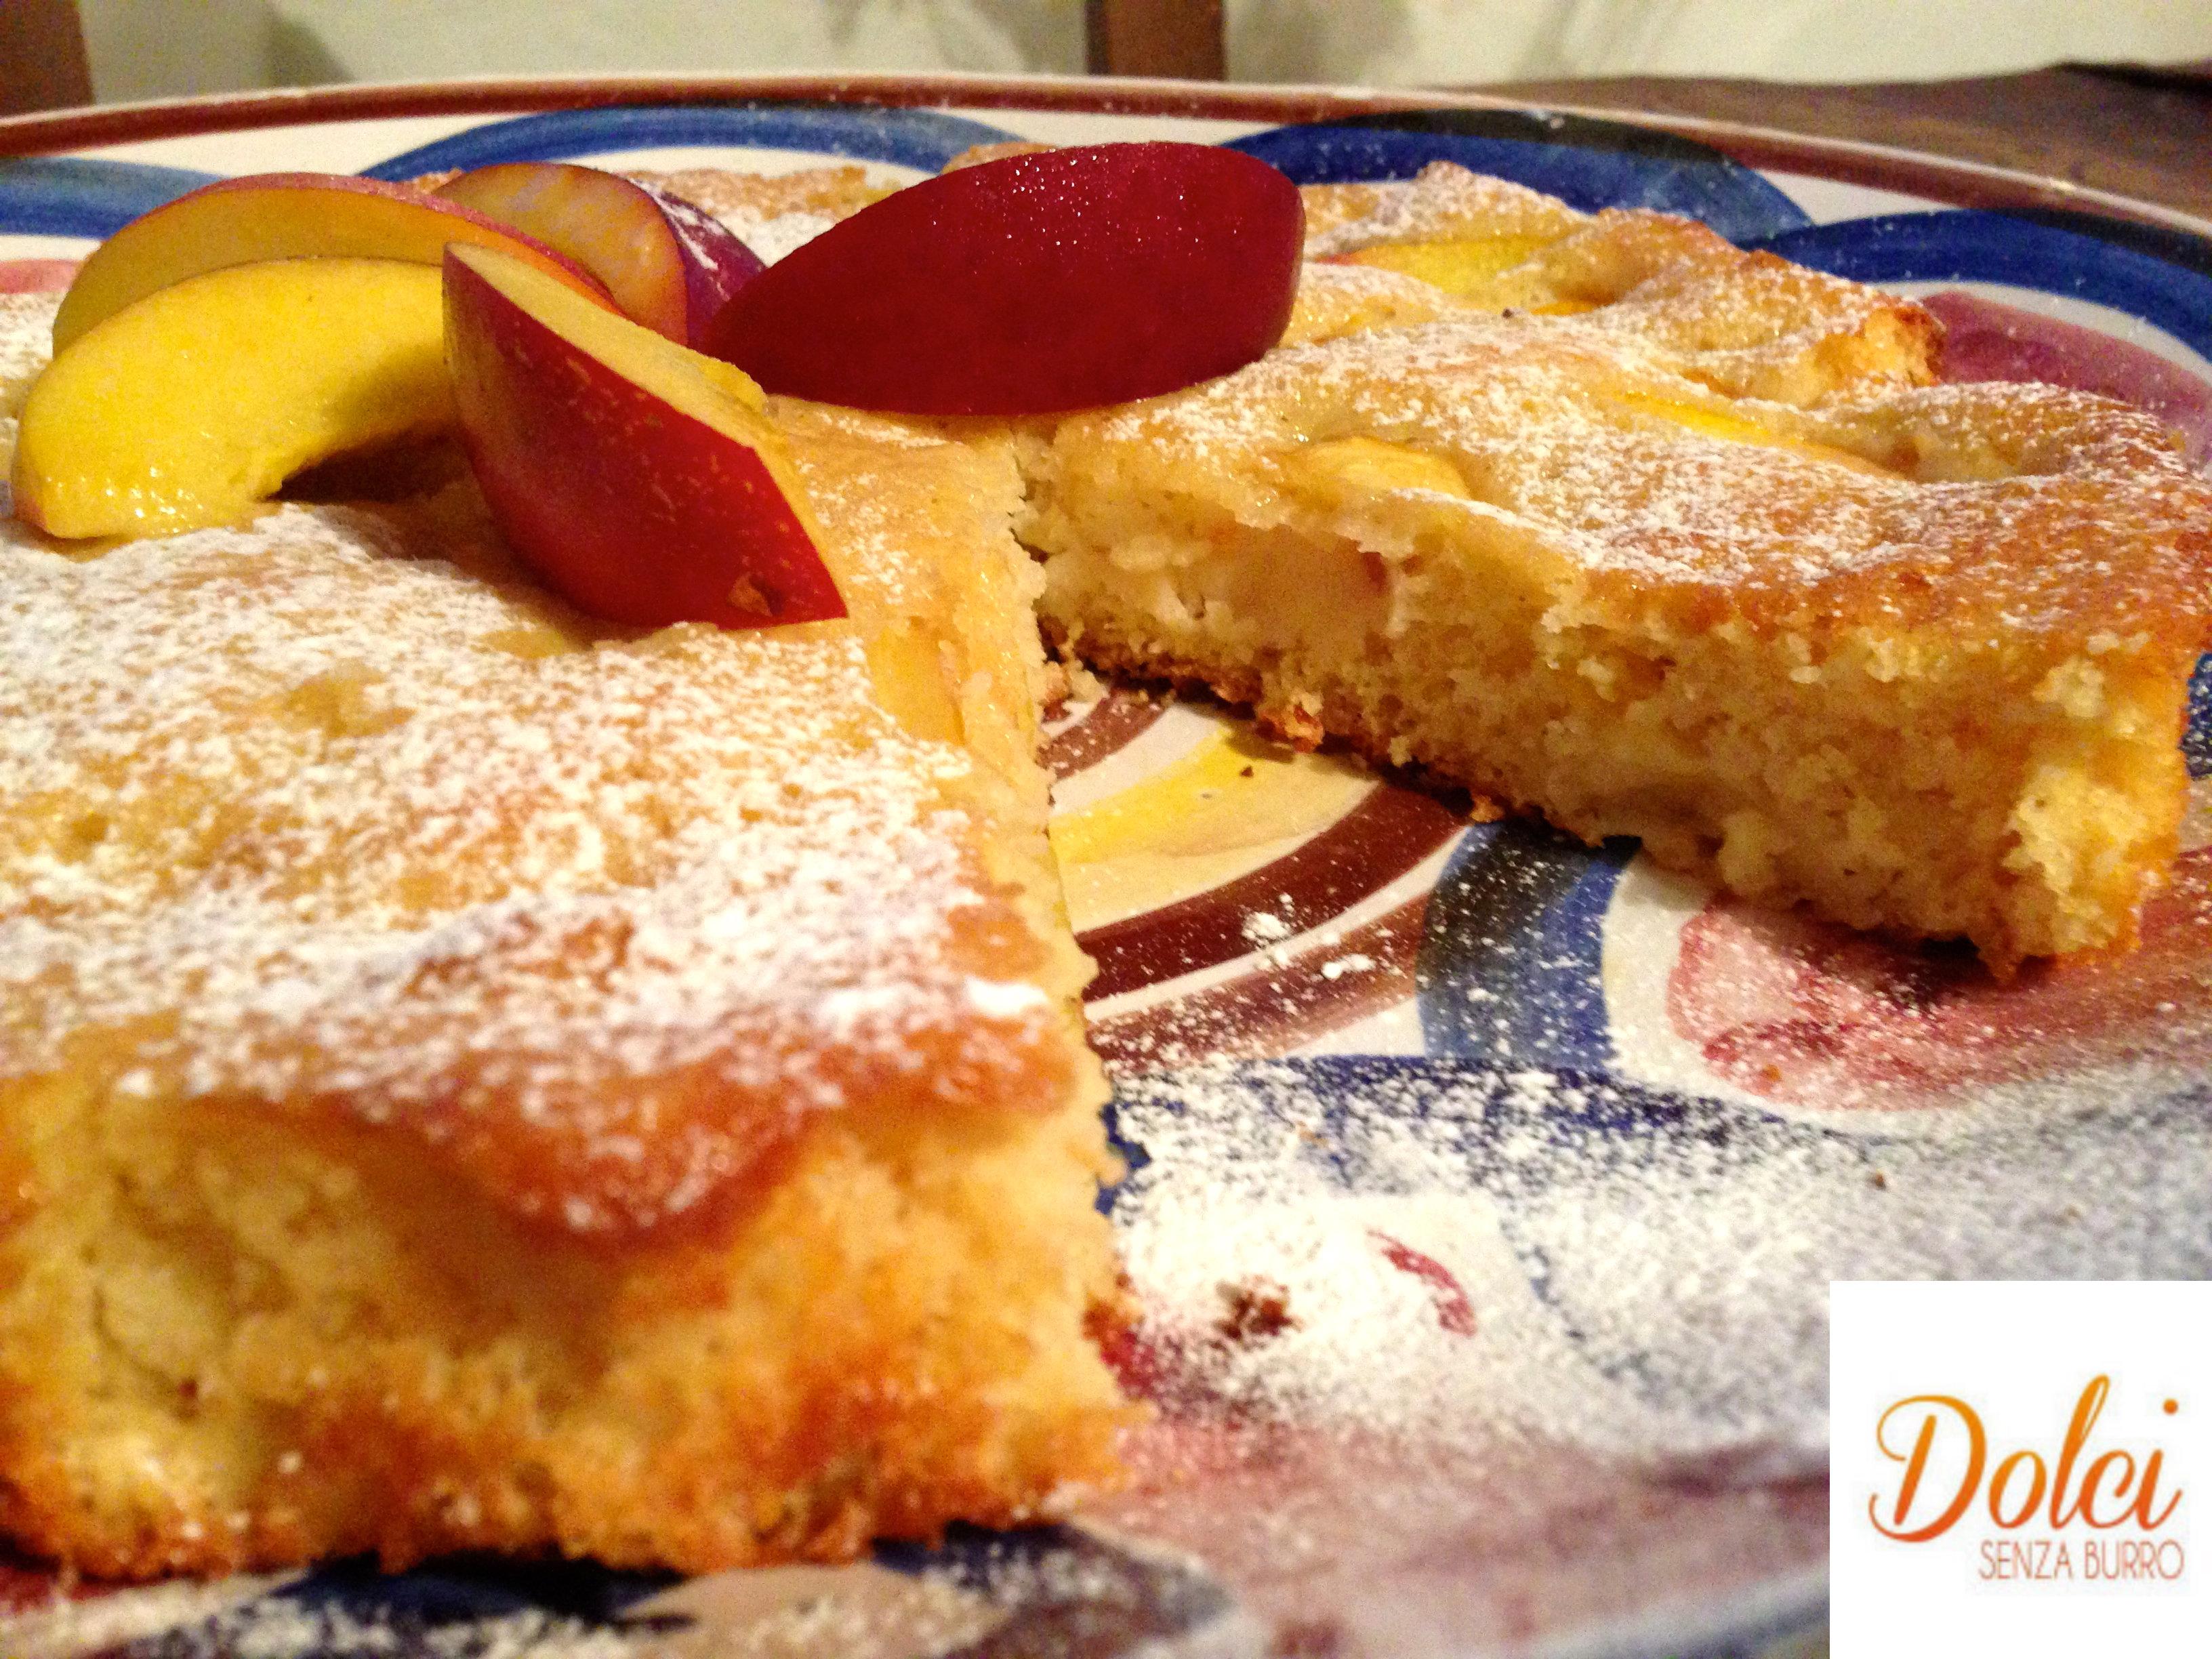 torta di pesche senza burro, la torta light di dolci senza burro